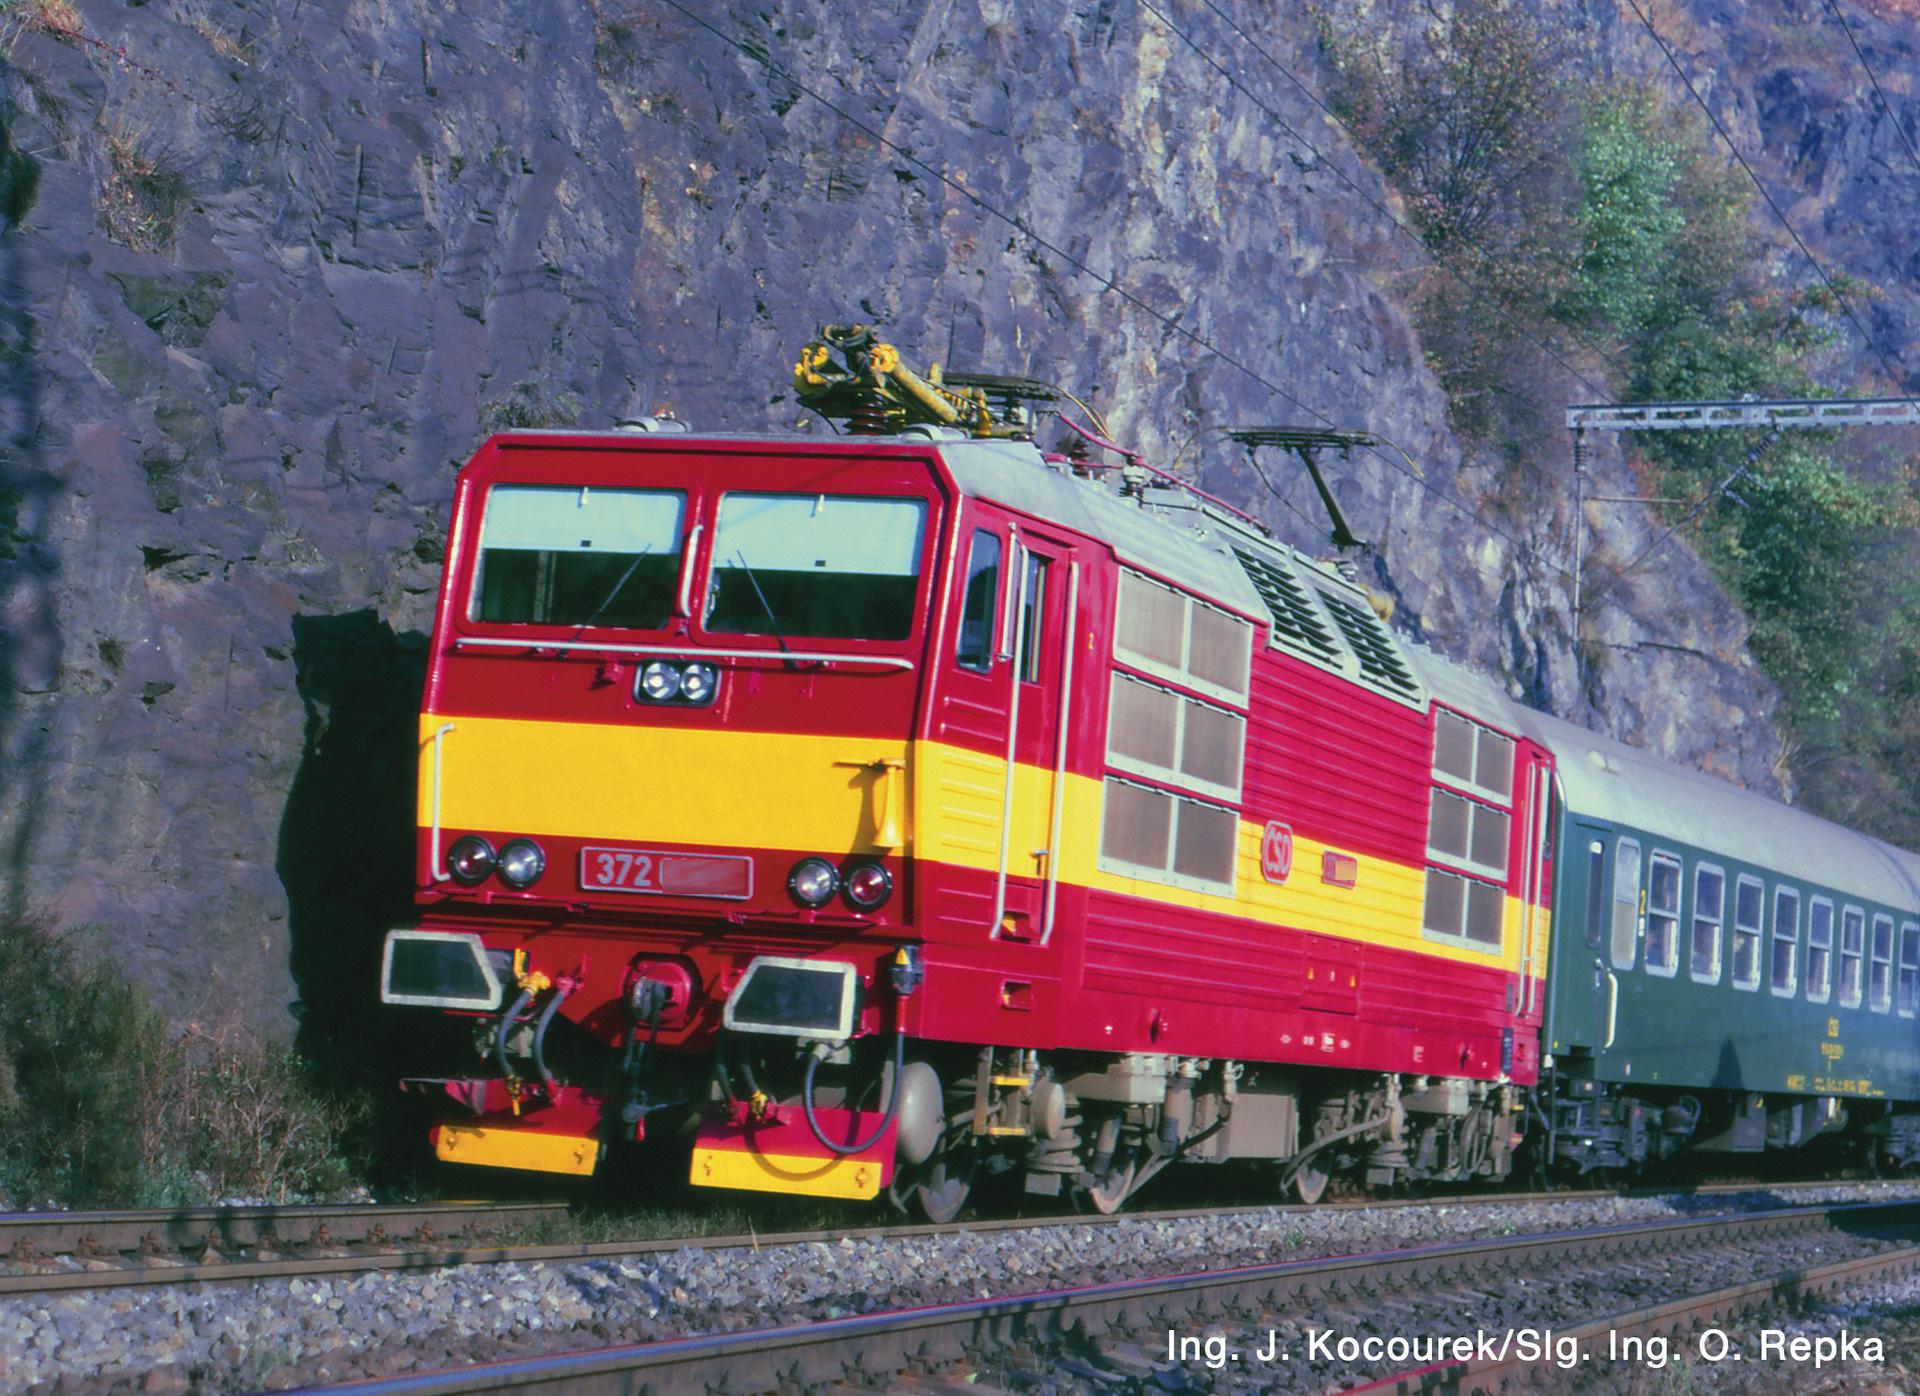 71221 E-Lok Rh 372 CSD-1